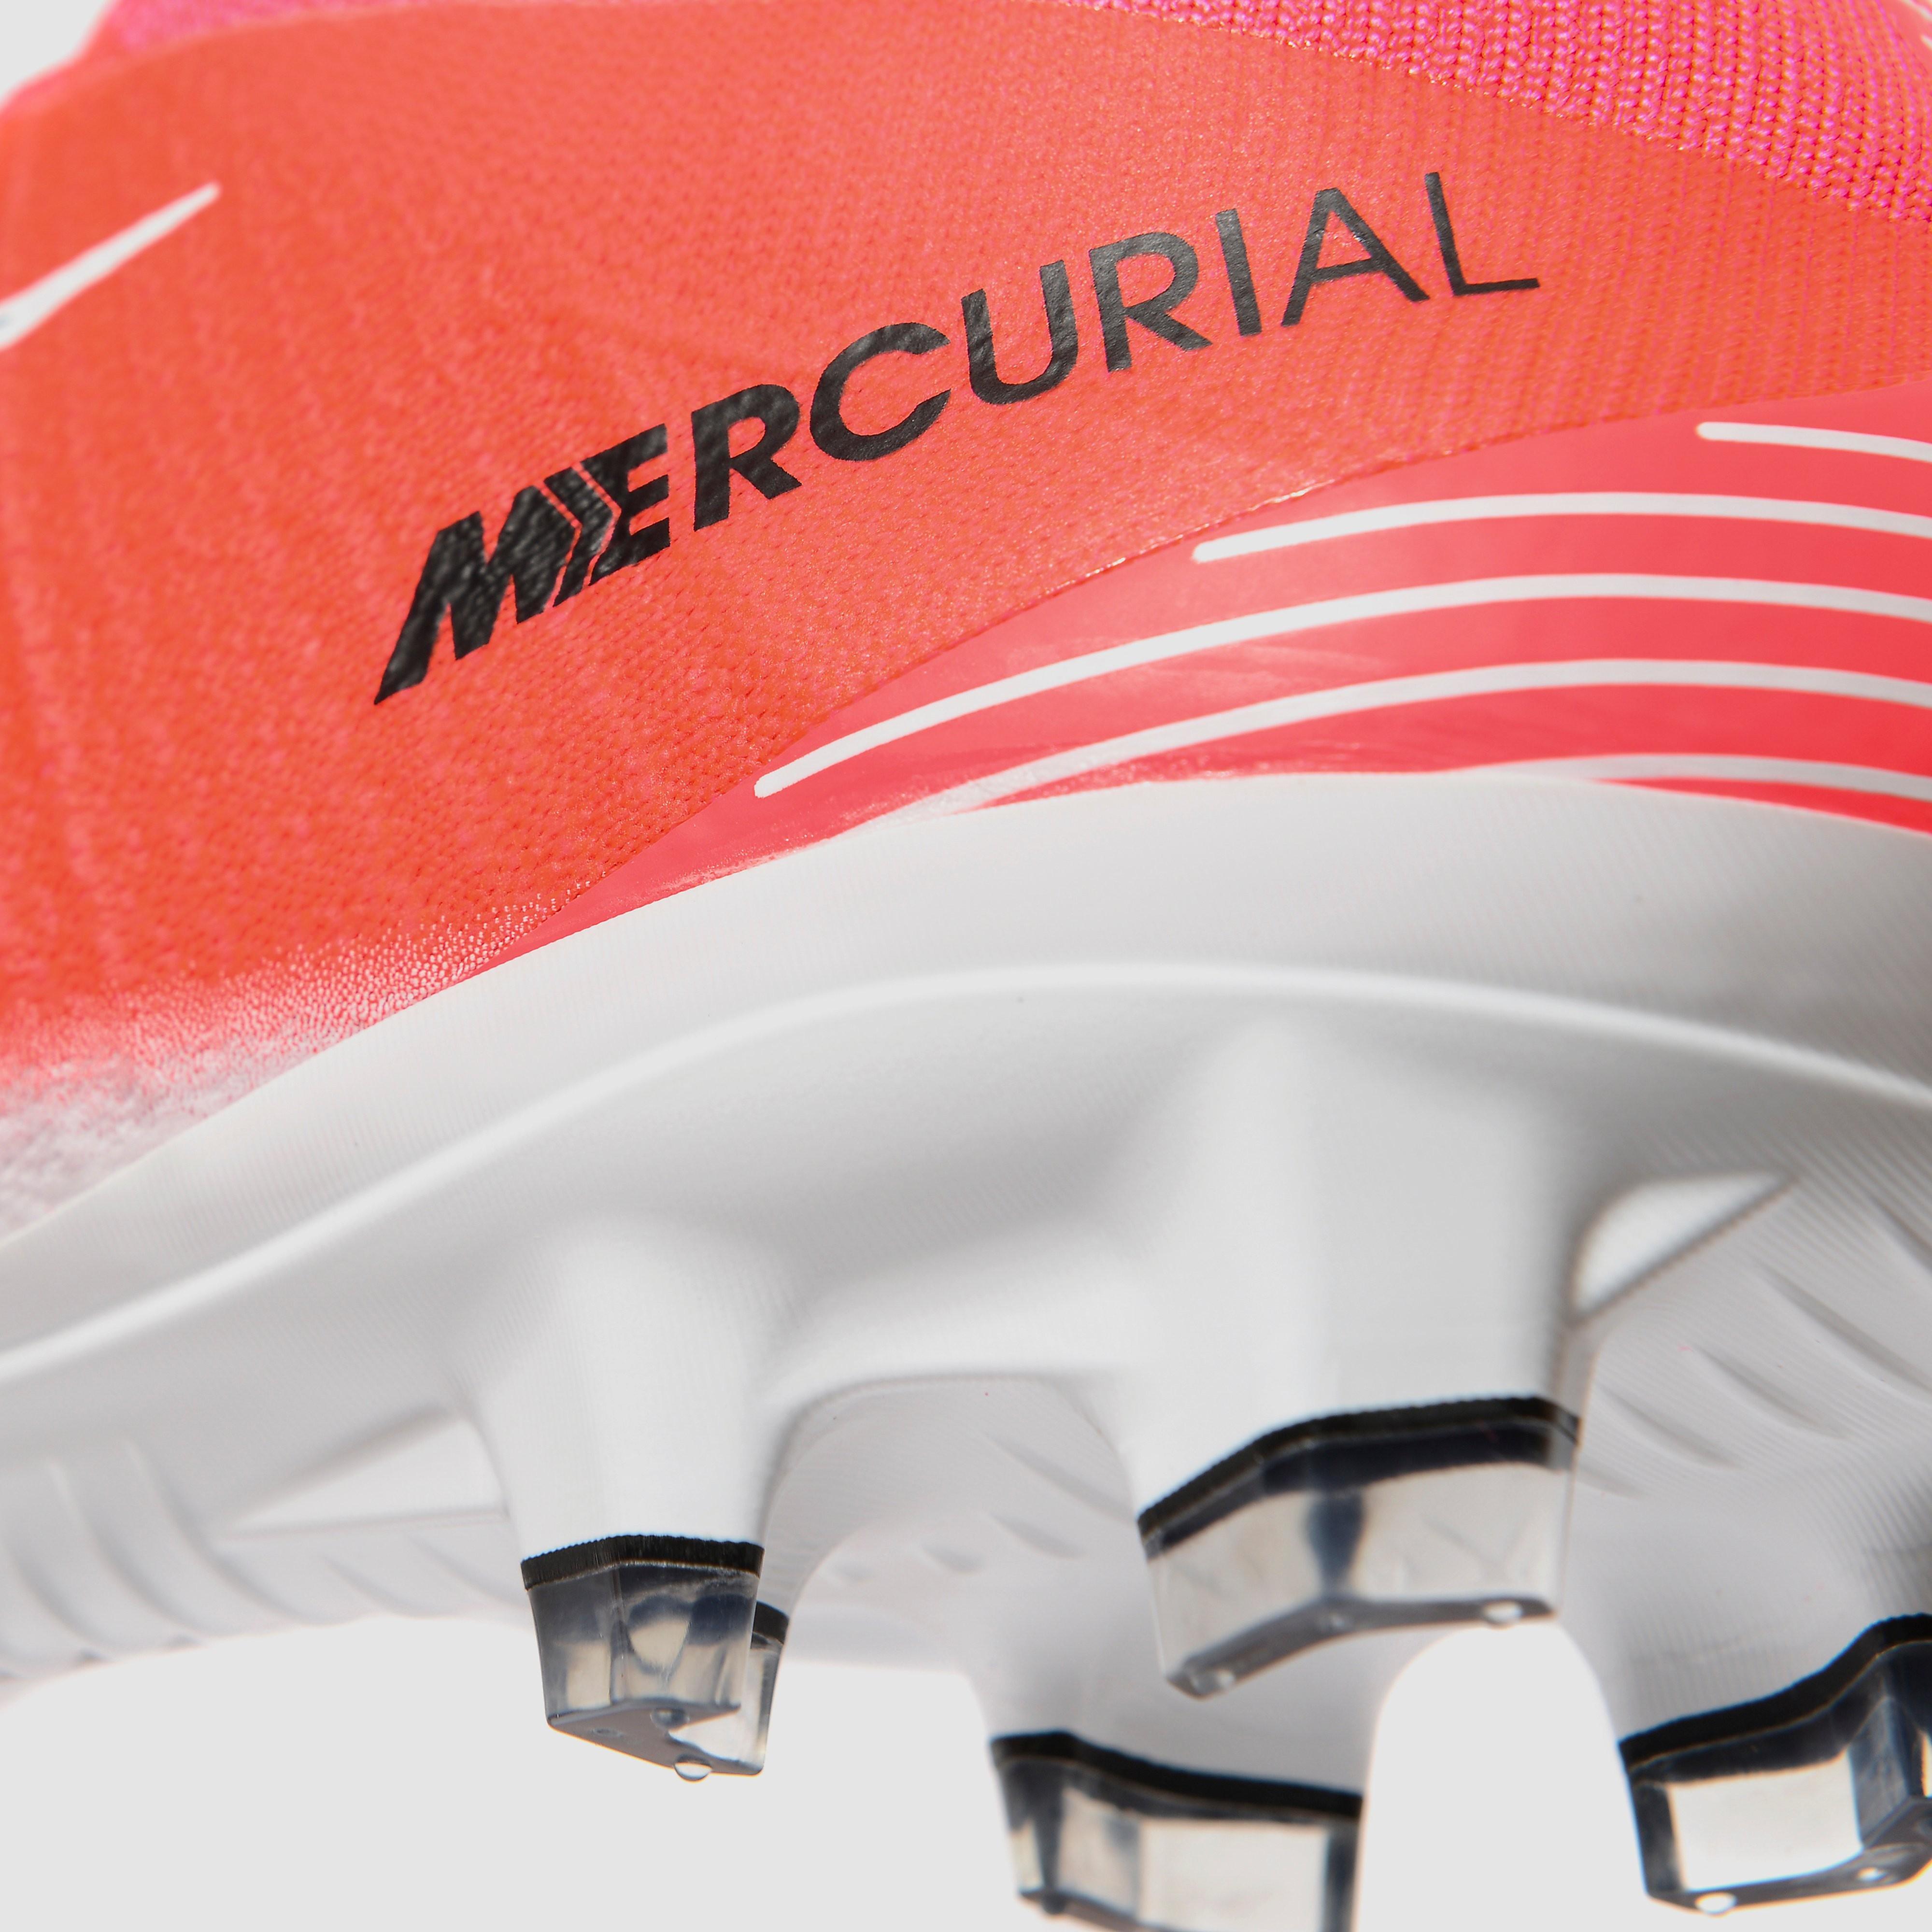 Nike Motion Blur Mercurial Superfly Men's FG Football Boots